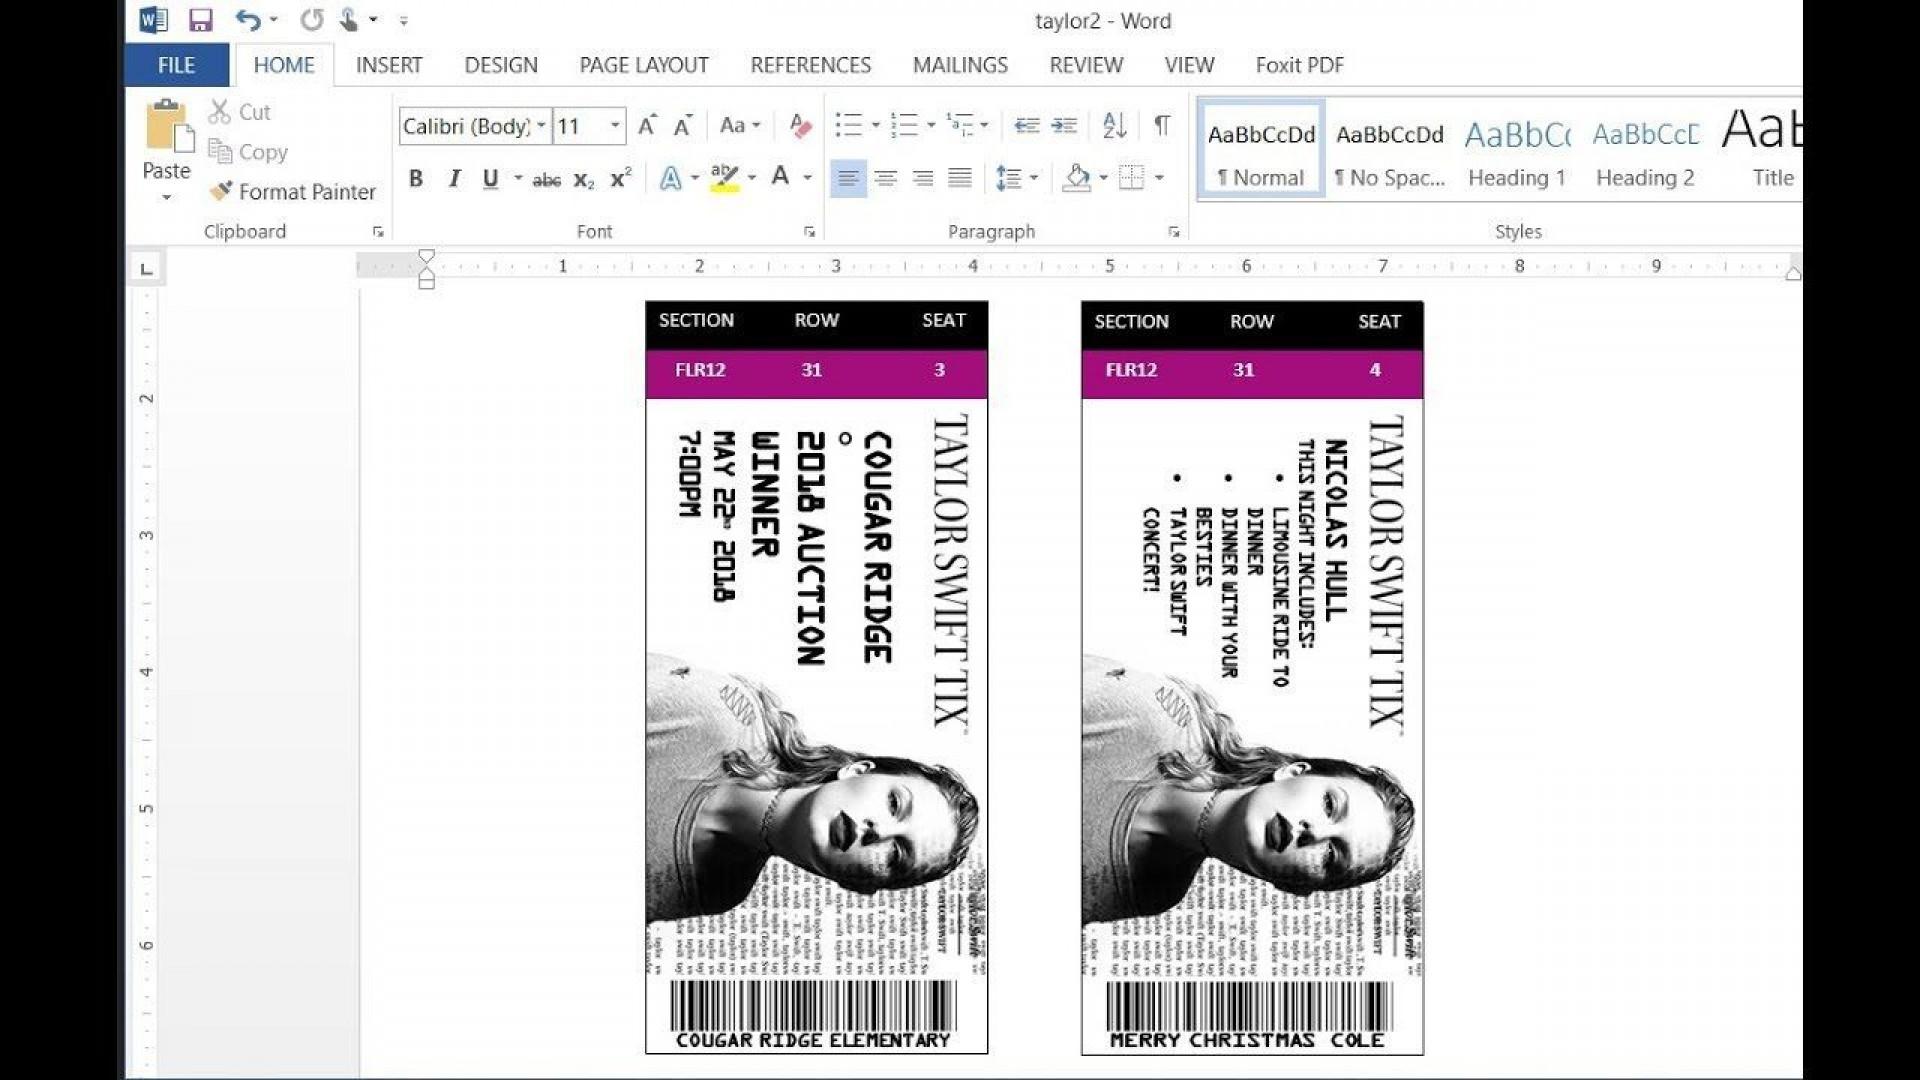 008 Unusual Concert Ticket Template Word Image  Free Microsoft1920